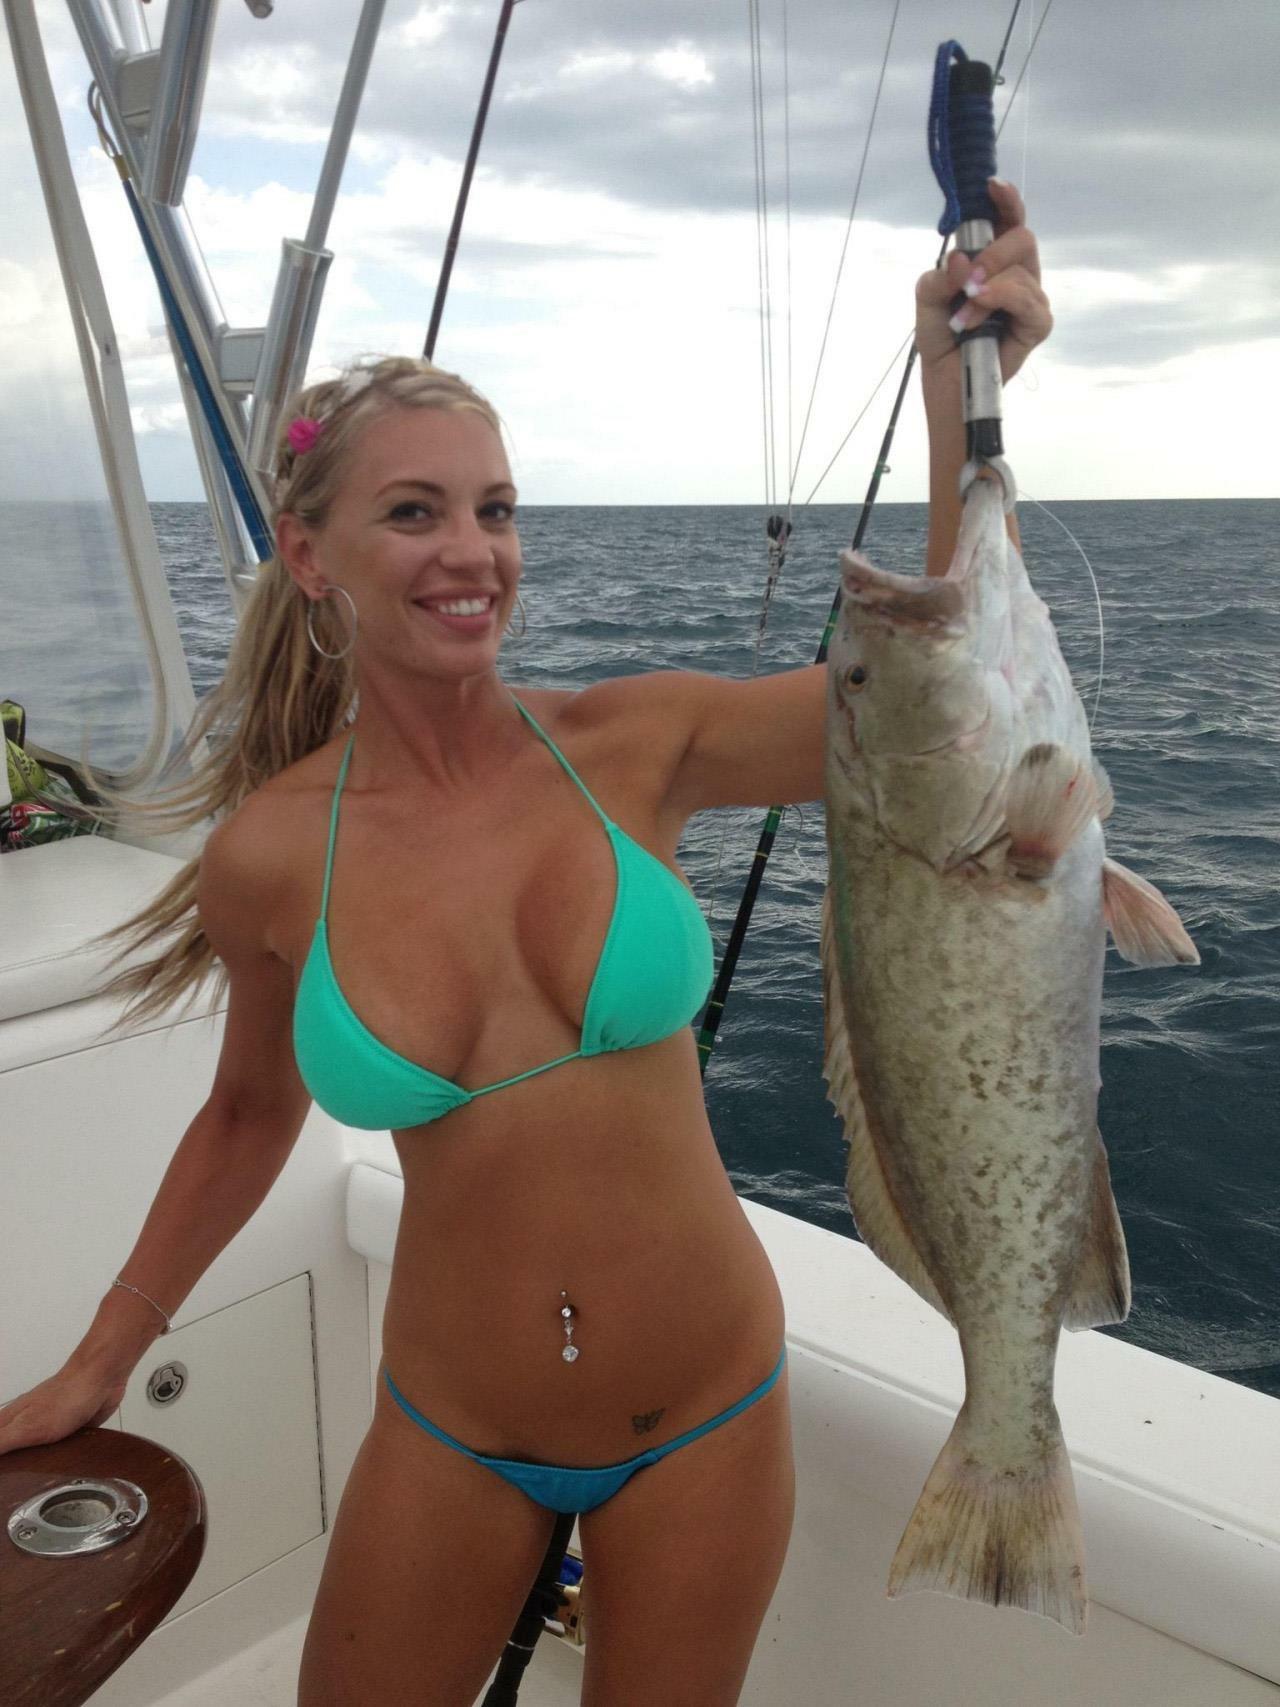 Рыбалка секс картинки мне